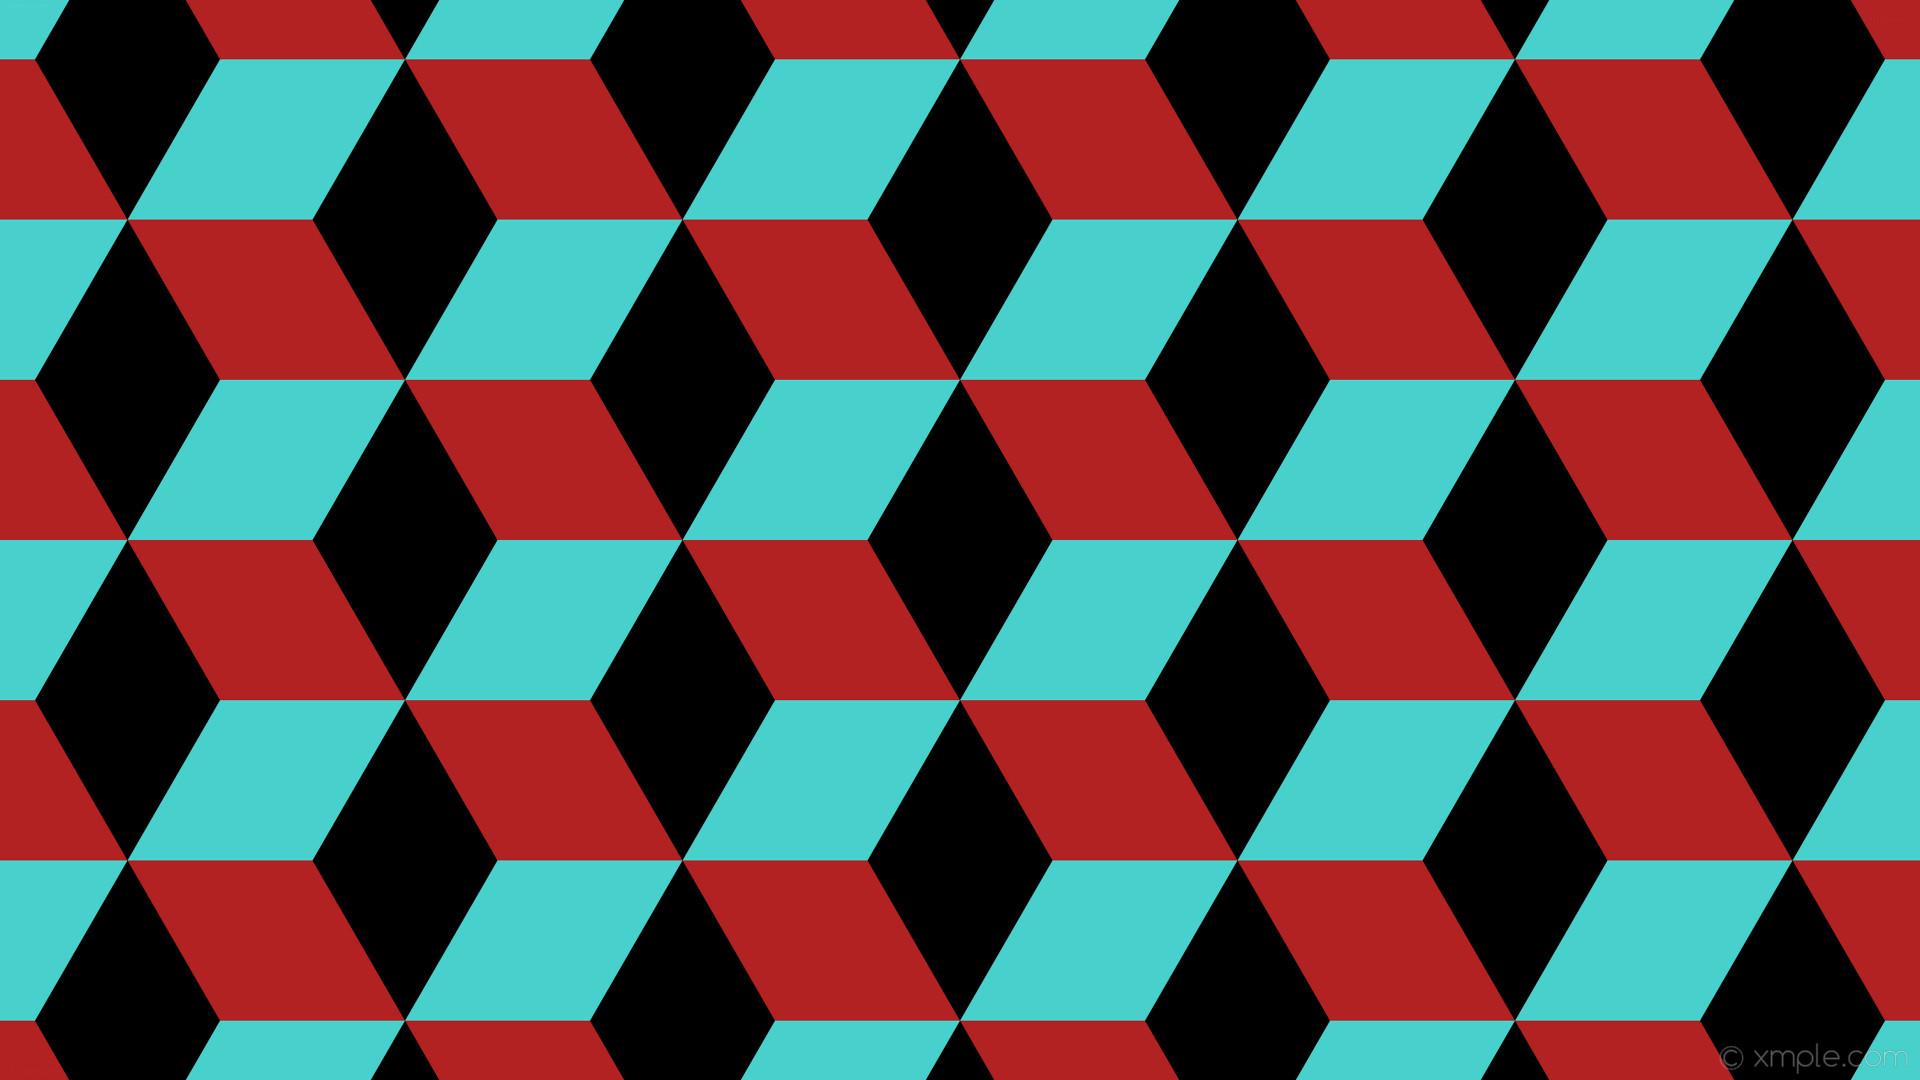 wallpaper red blue 3d cubes black medium turquoise fire brick #000000  #48d1cc #b22222